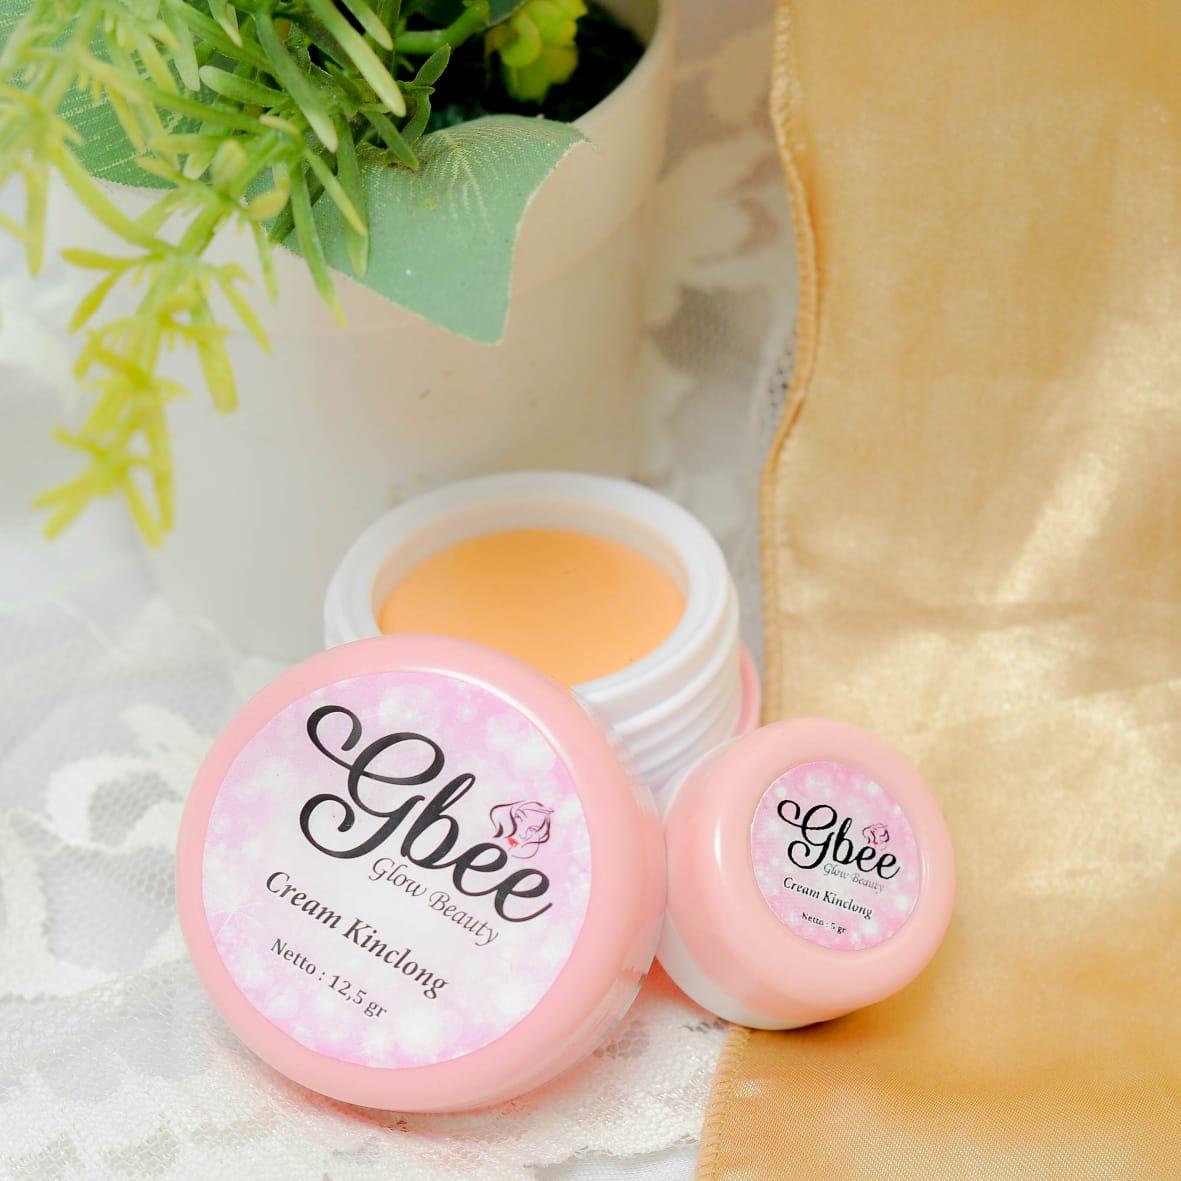 Gbe Cream